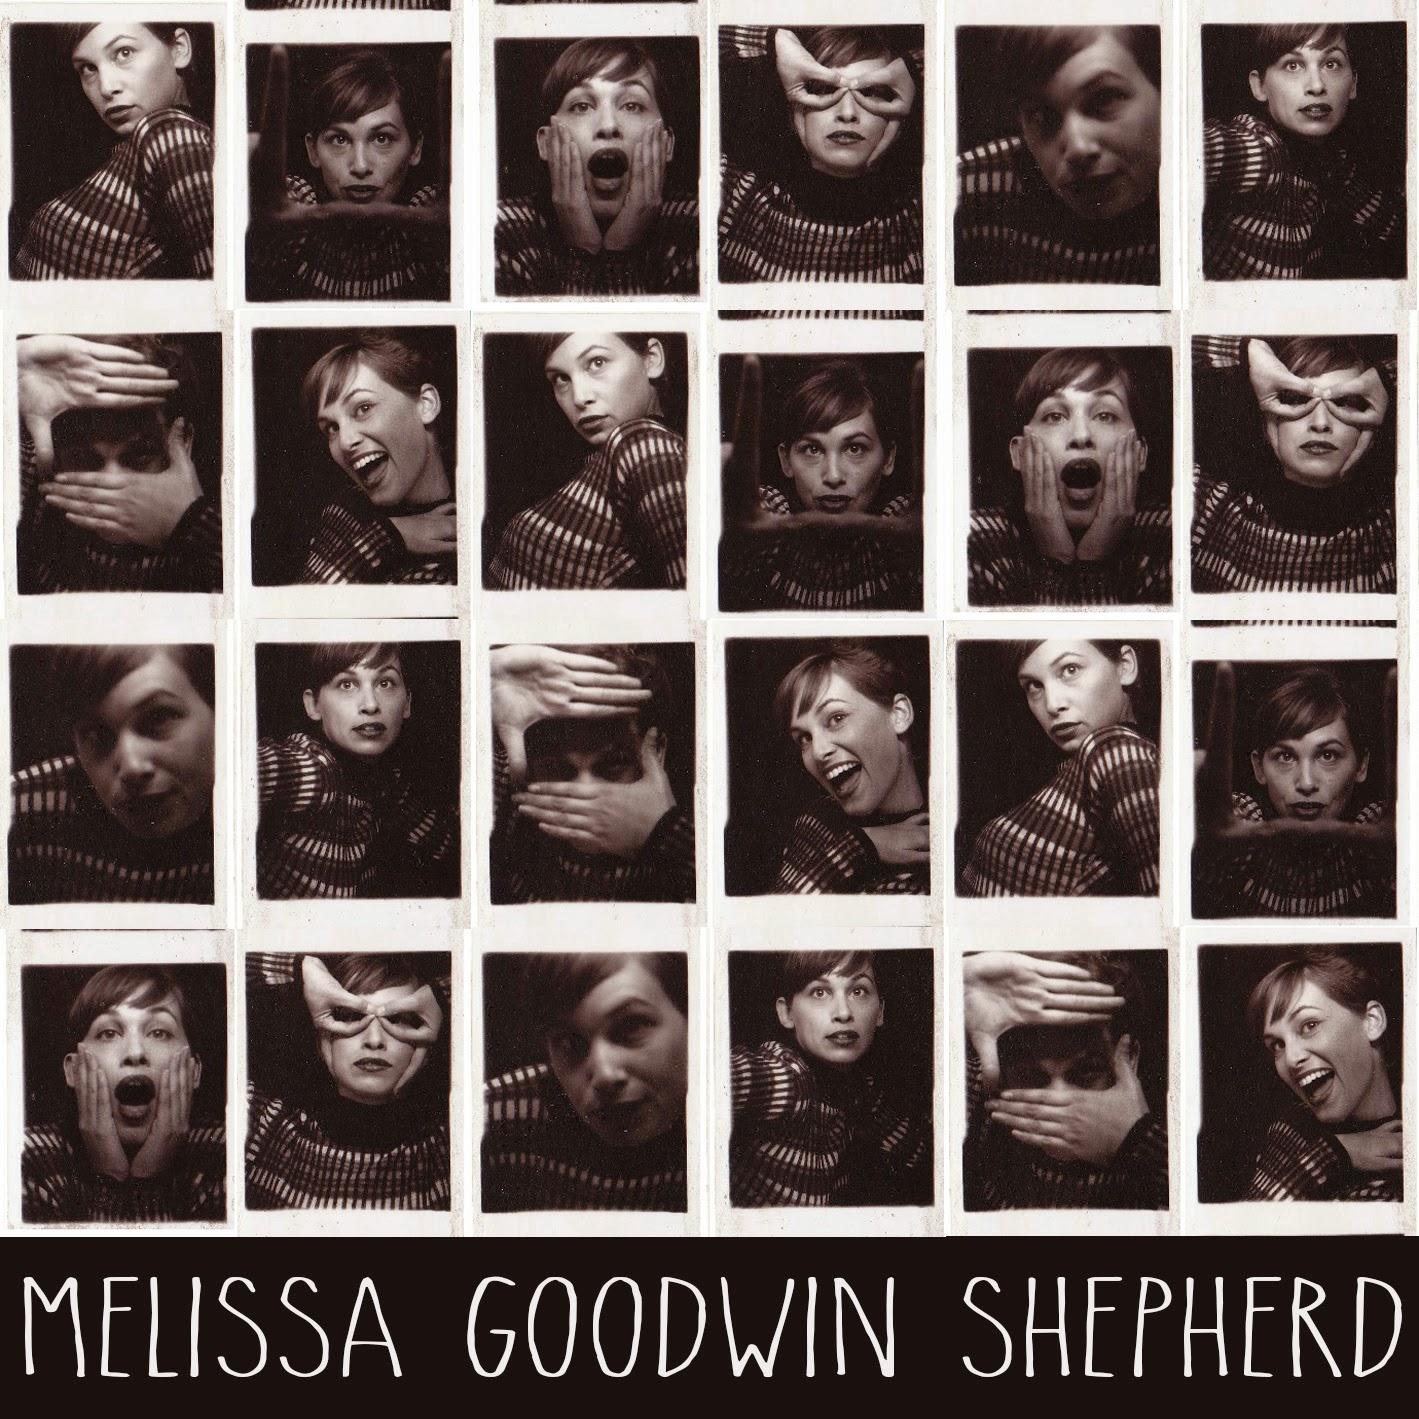 Melissa Goodwin Shepherd Nude Photos 44